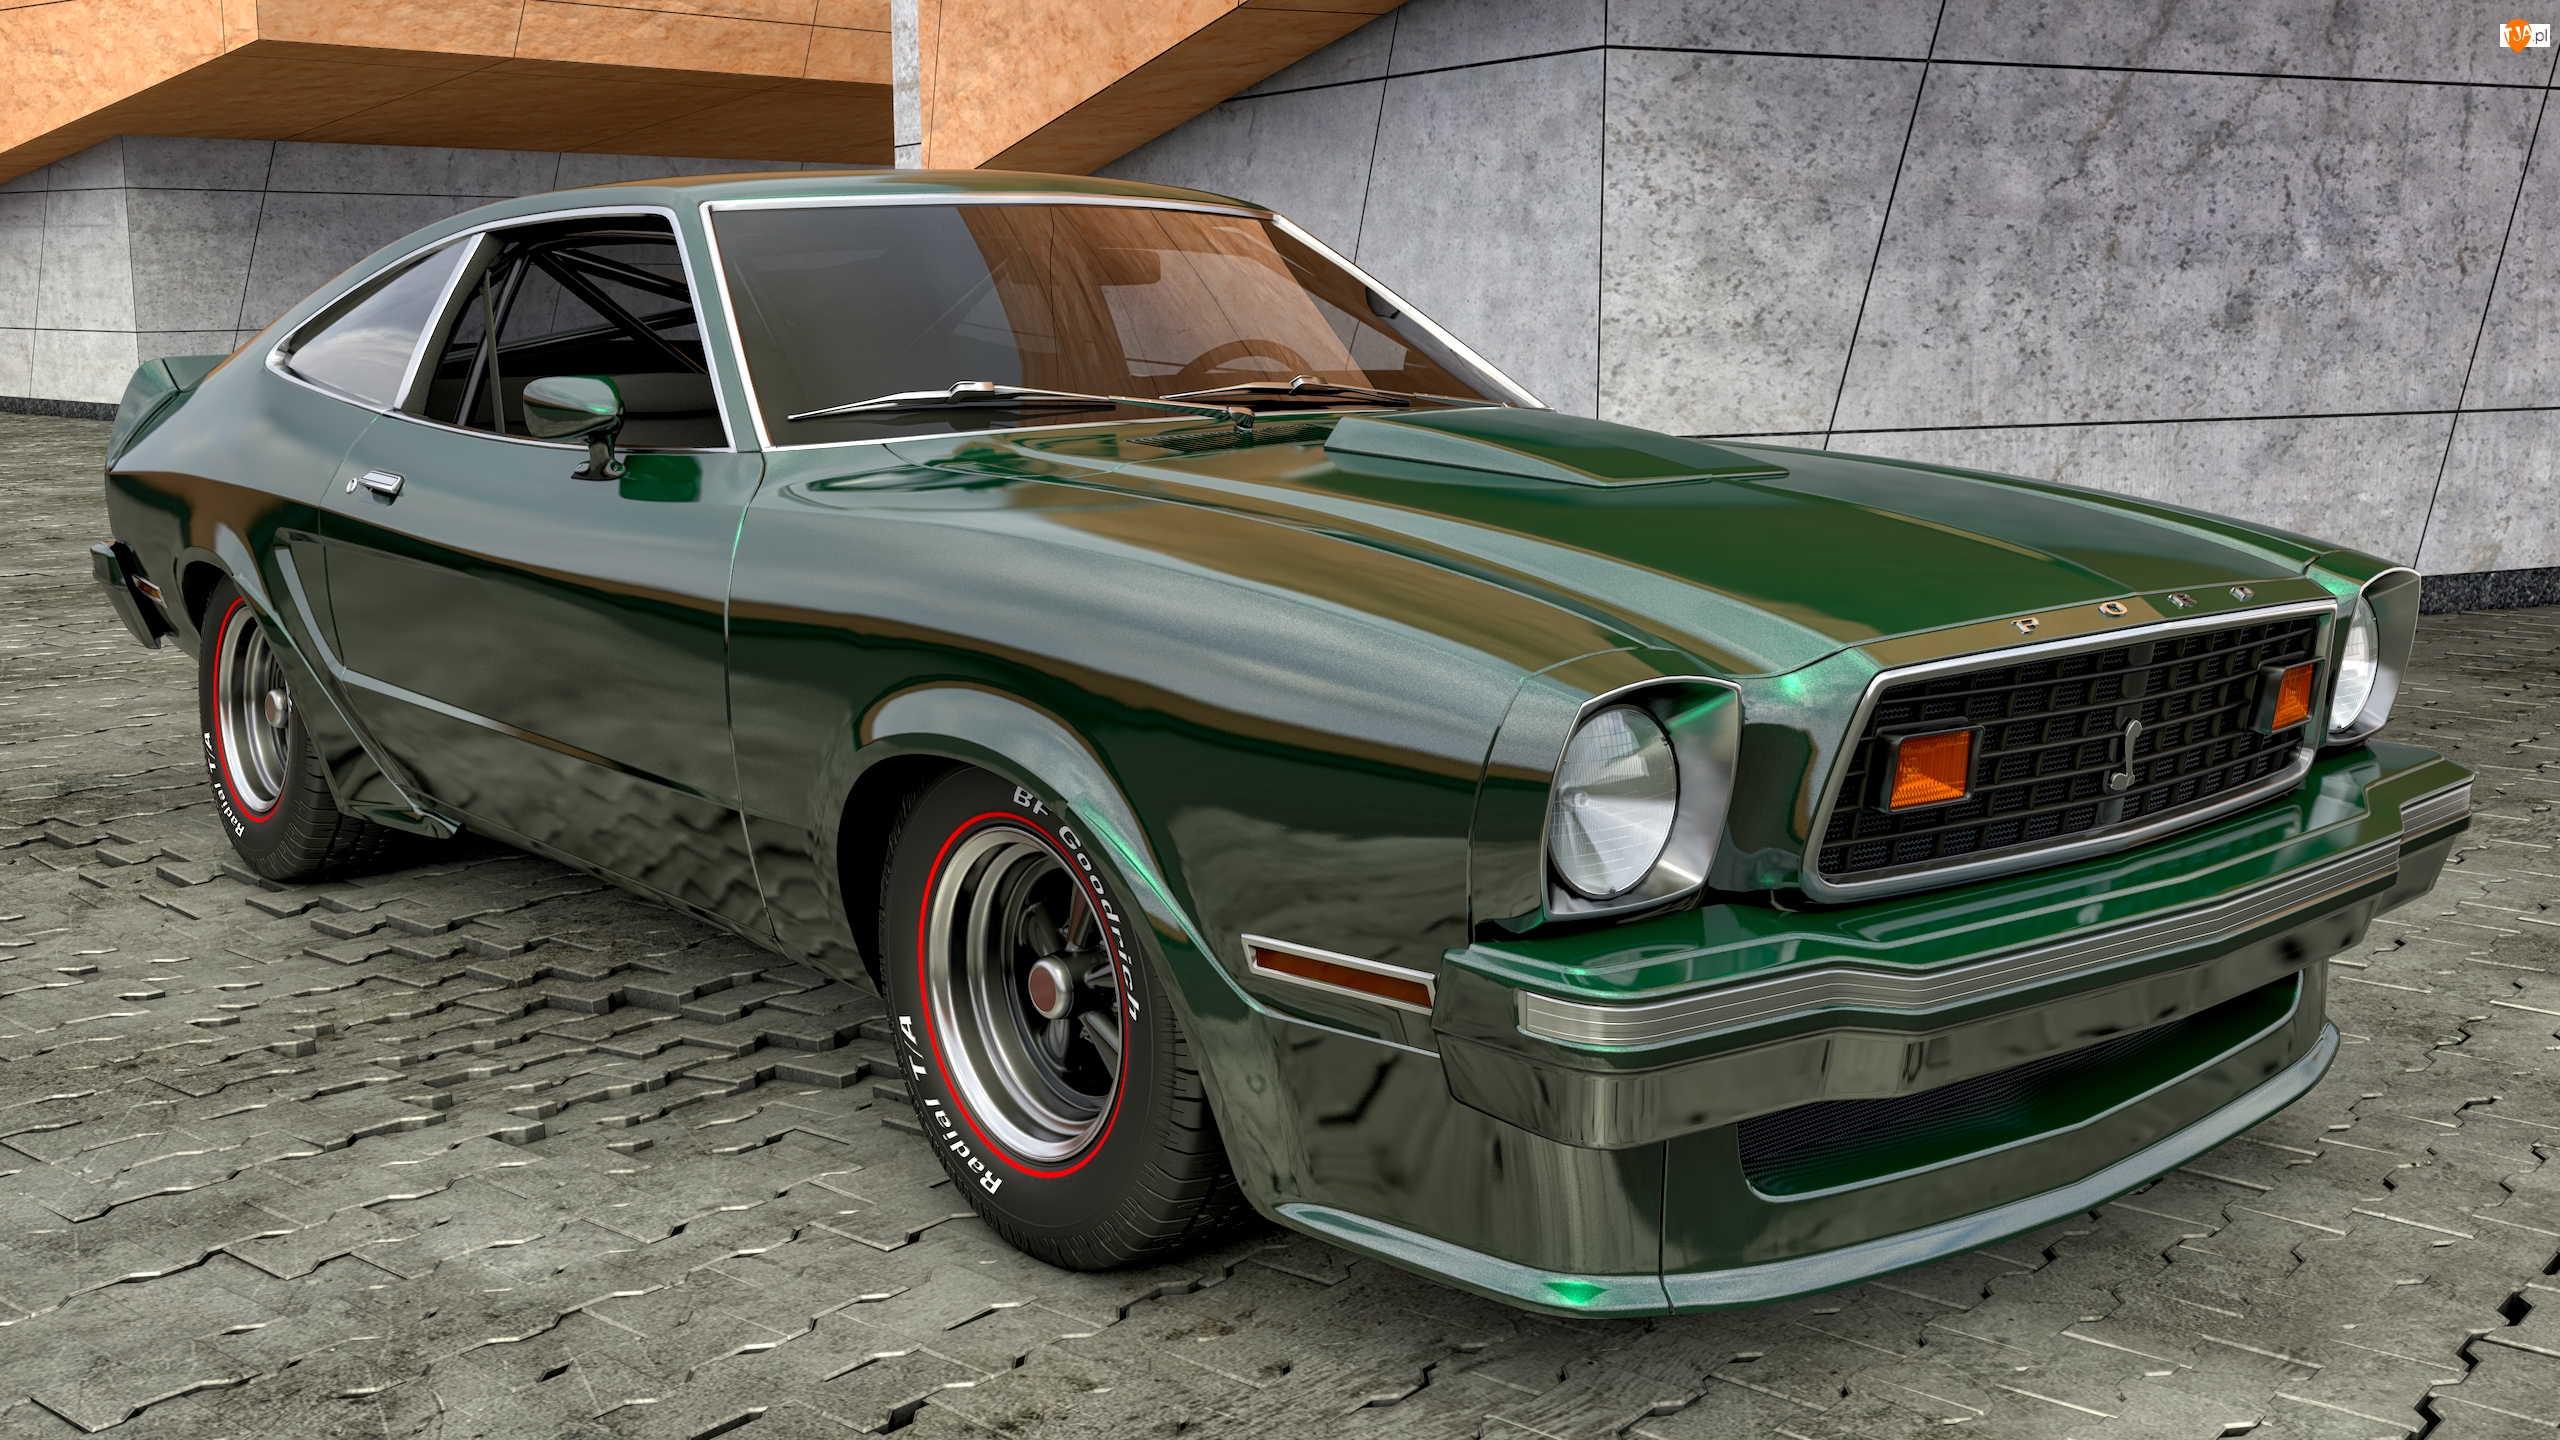 Zabytkowy, 1978, Zielony, Ford Mustang King Cobra